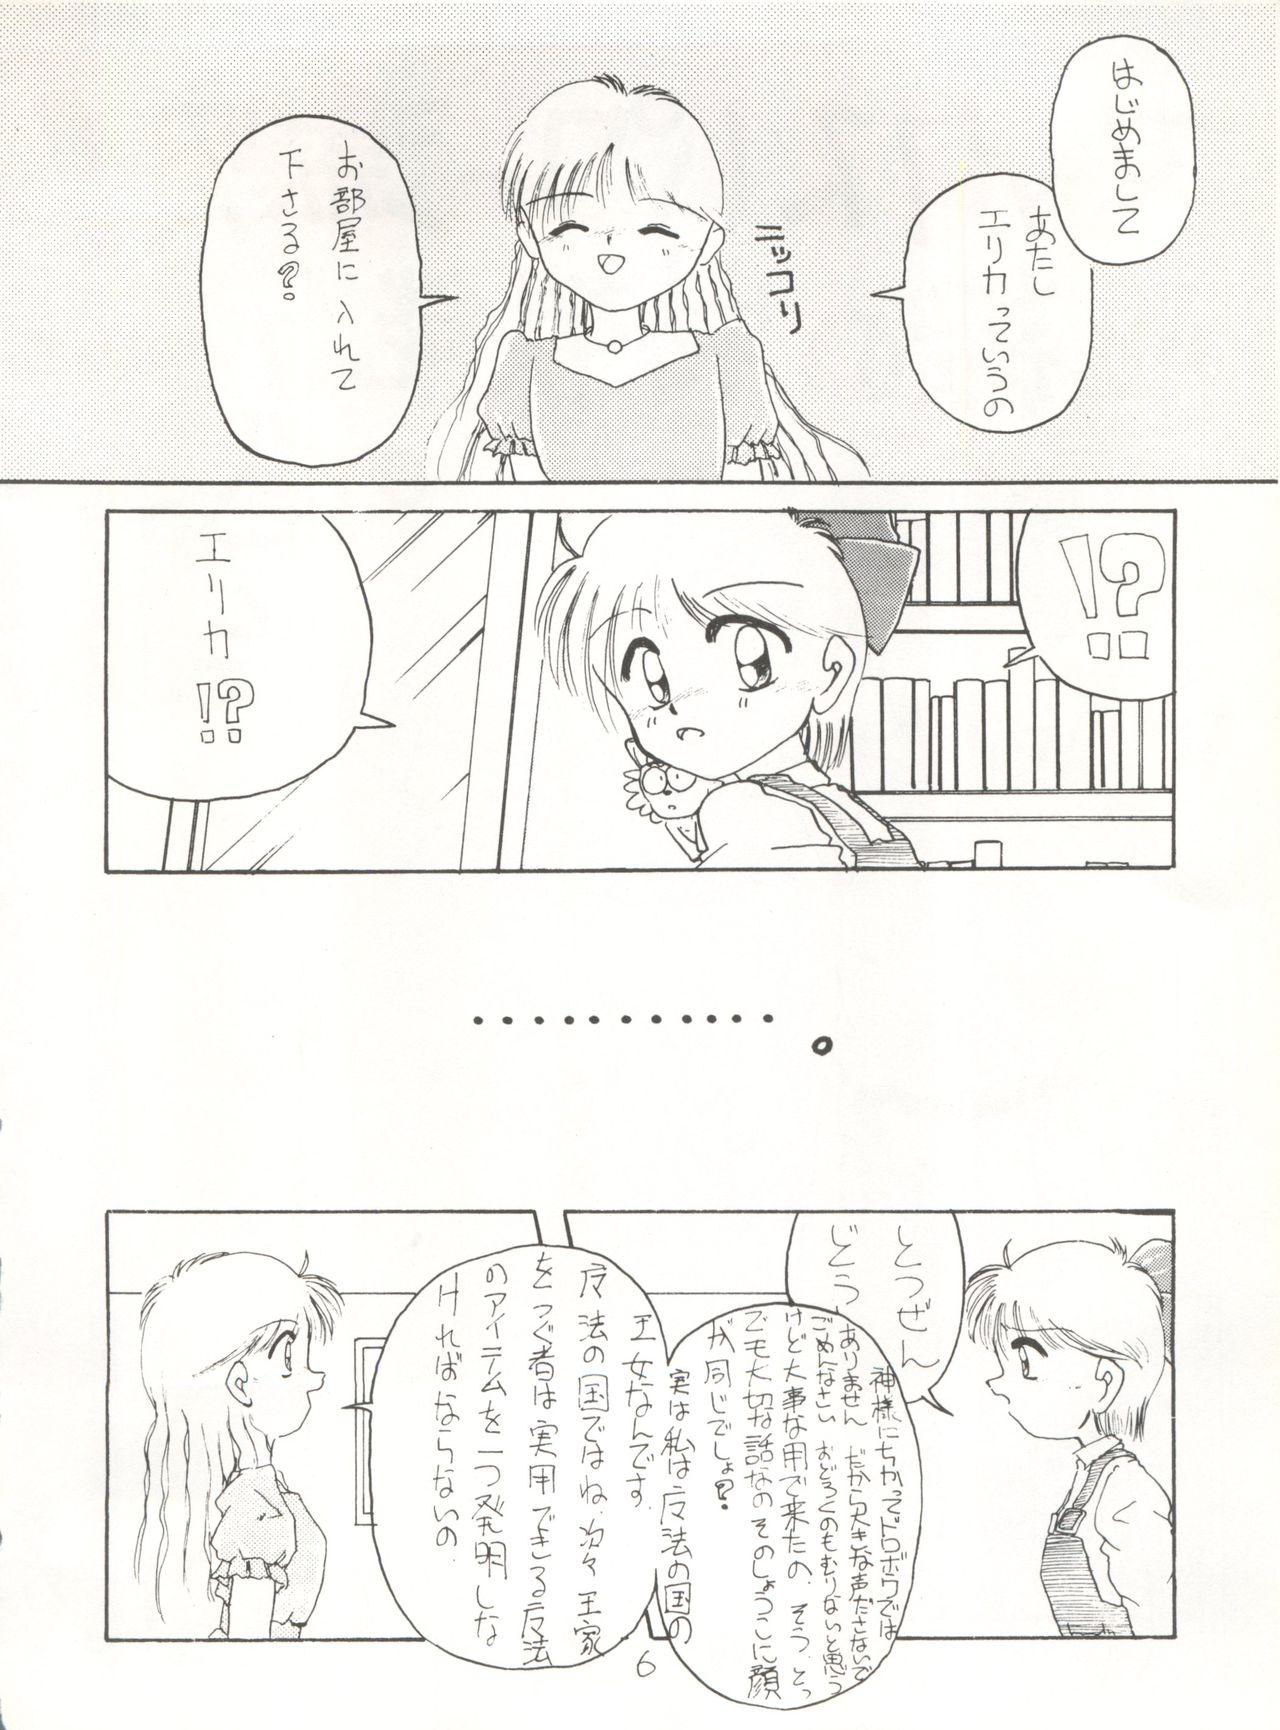 [Global One (MARO)] Sadistic 5 (Cutey Honey, Devilman, Sailor Moon), [Global One (MARO)] Sadistic (Dirty Pair, Fushigi no Umi no Nadia, Sailor Moon), [Studio Ikkatsumajin] .ribbon (Hime-chan's Ribbon) 129